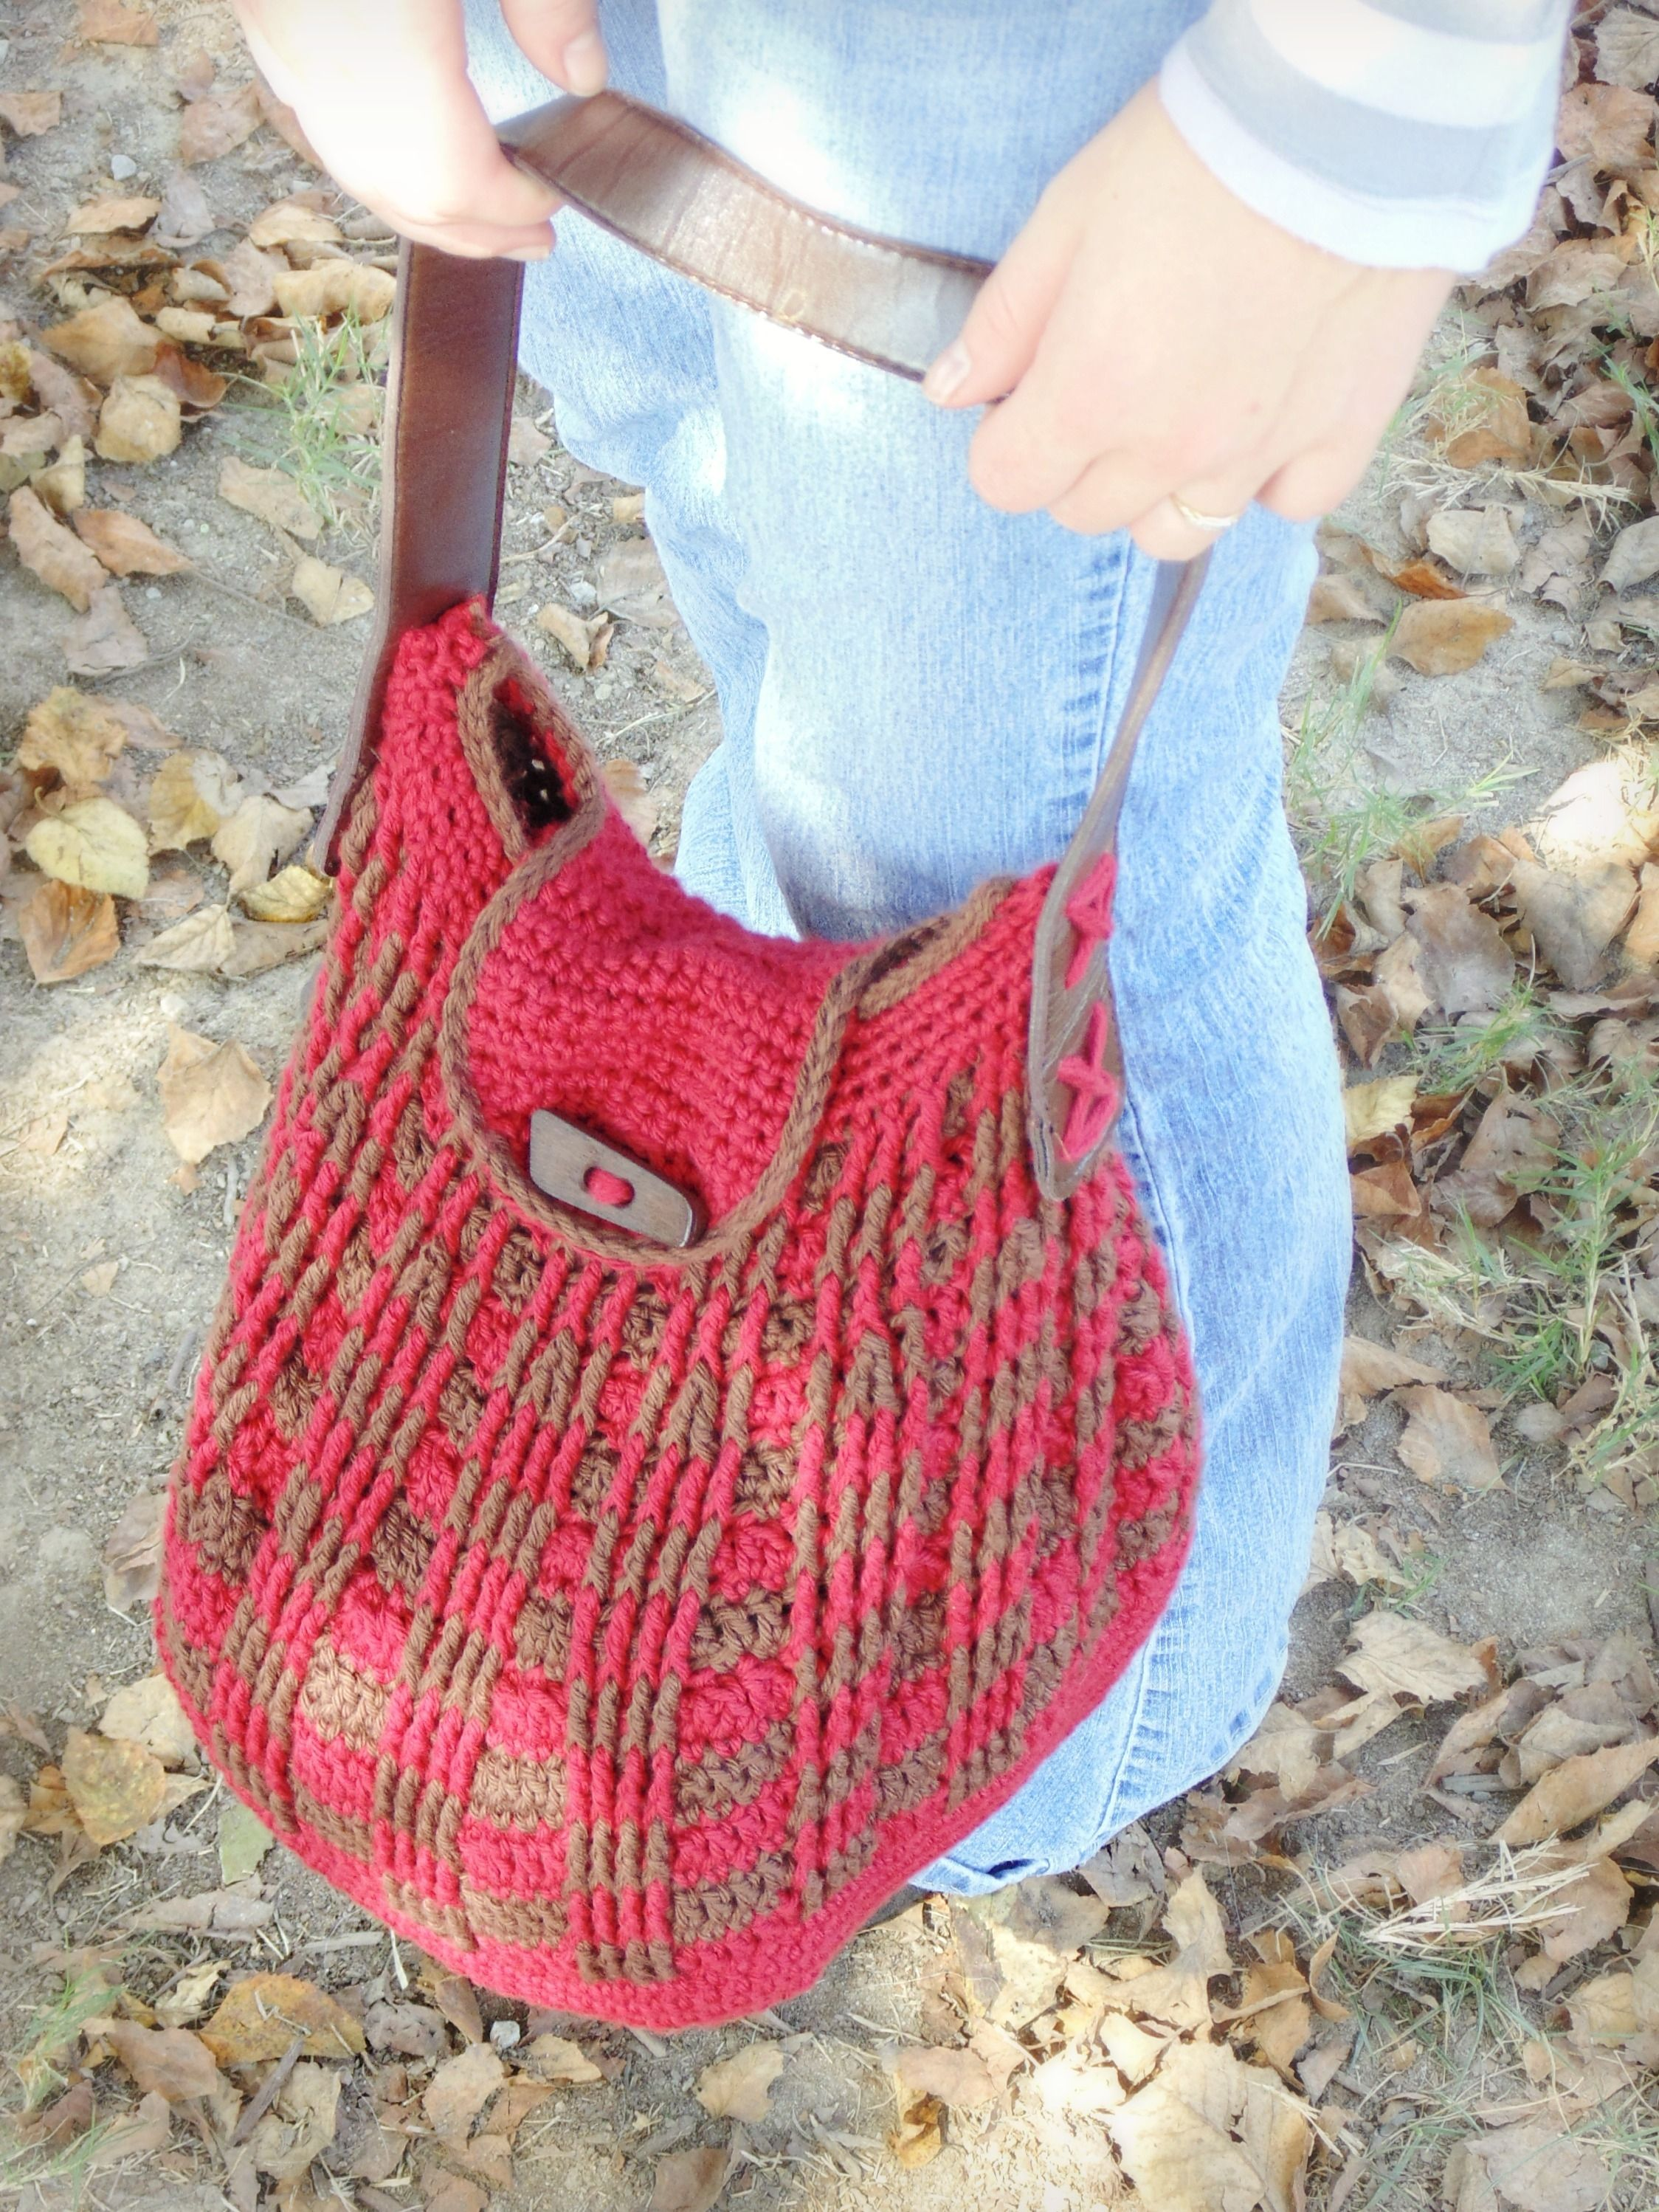 Creative Crochet Patterns from RAKJpatterns.